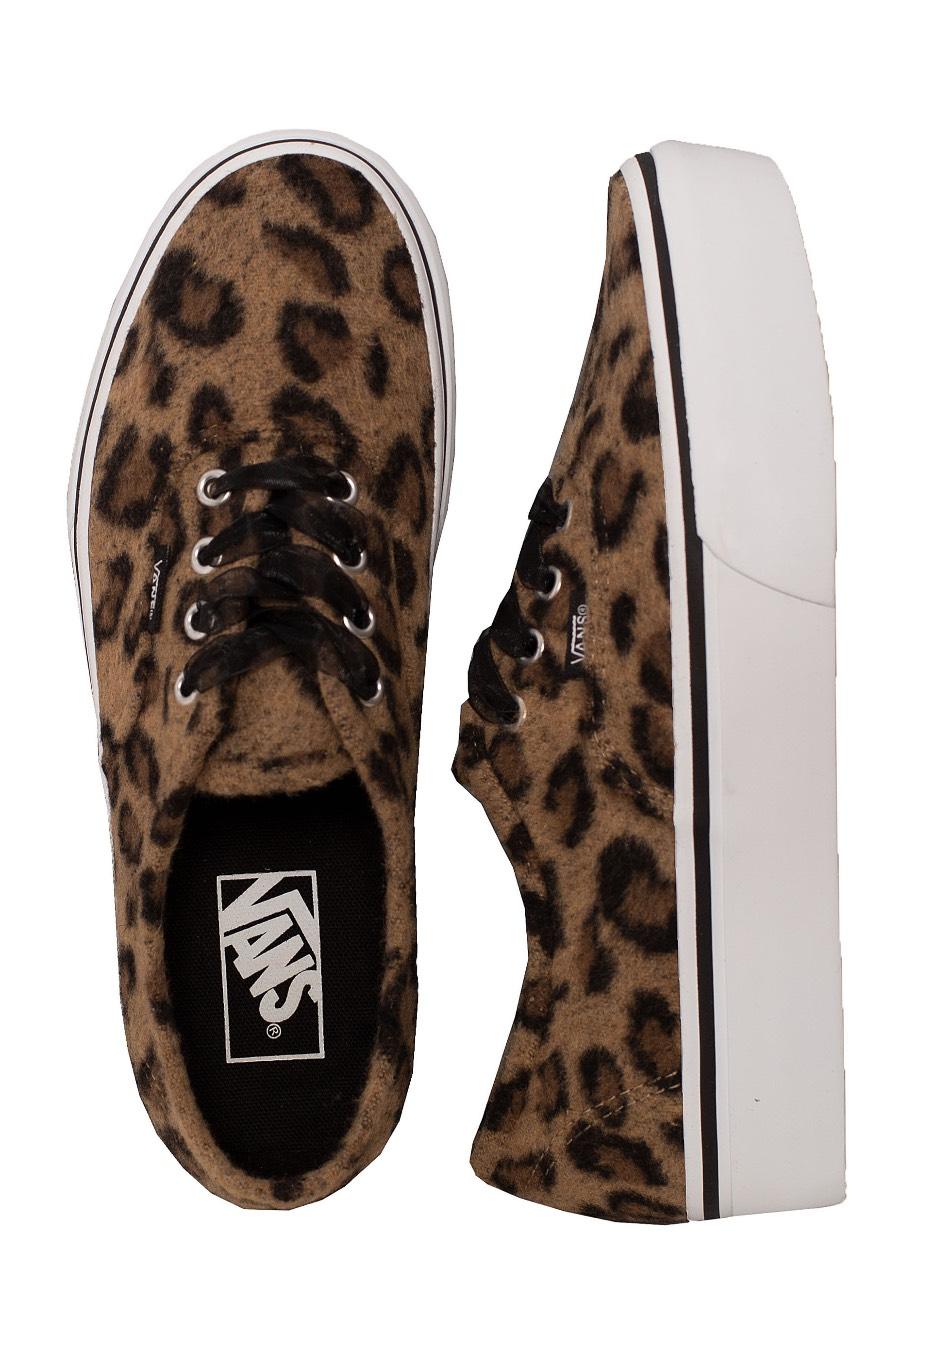 Vans - Authentic Platform 2.0 Fuzzy Leopard - Zapatos para chica -  Impericon.com ES cff1cf80e99